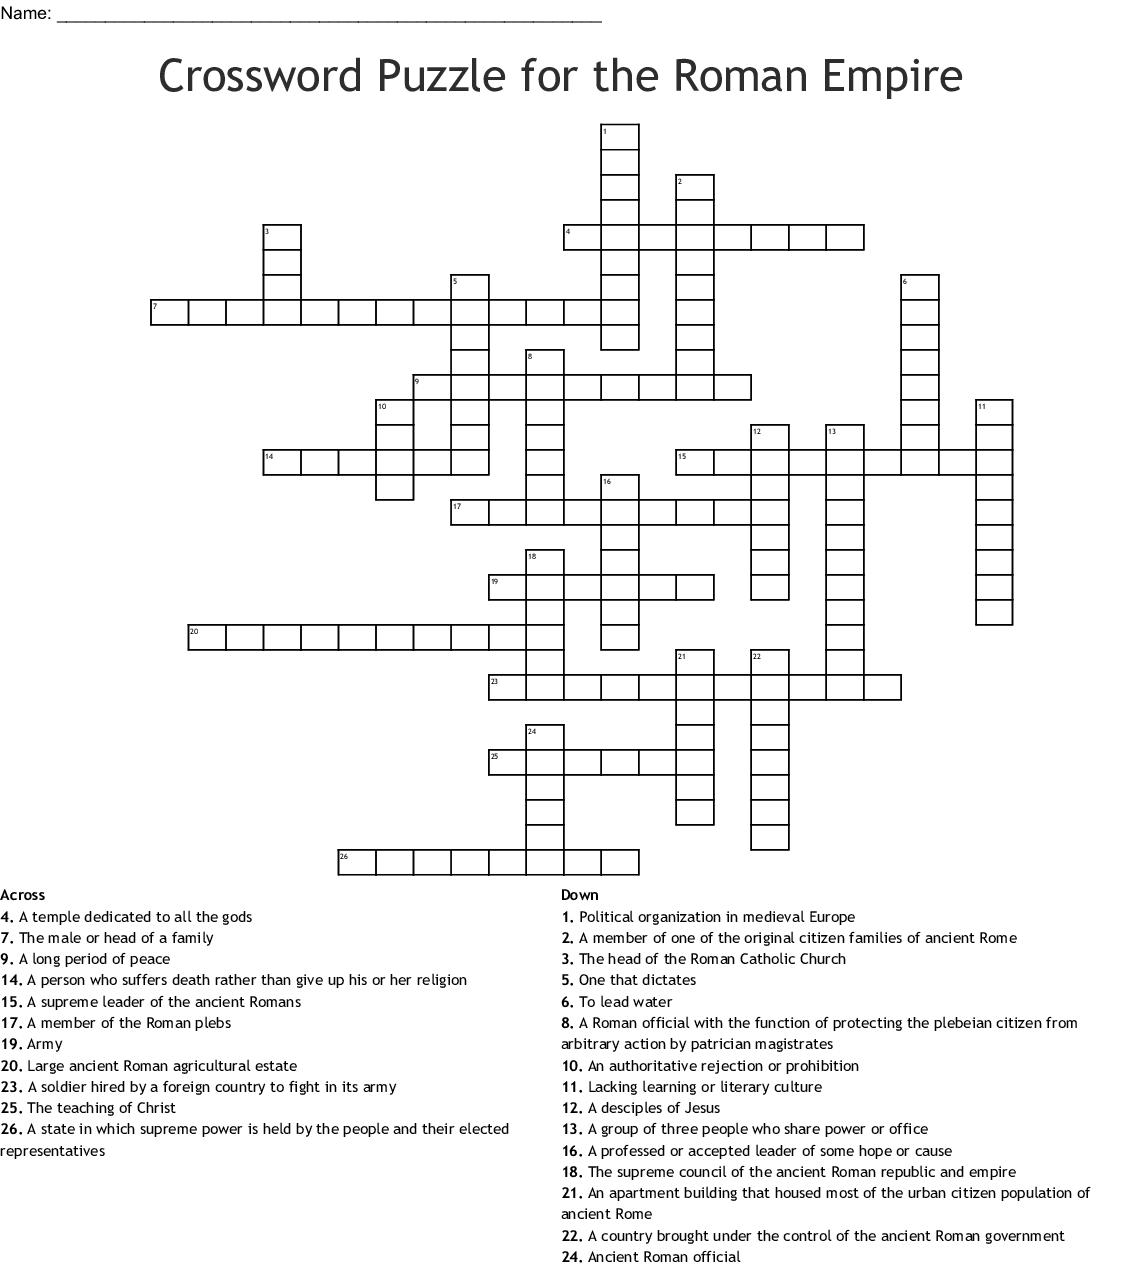 Crossword Puzzle For The Roman Empire